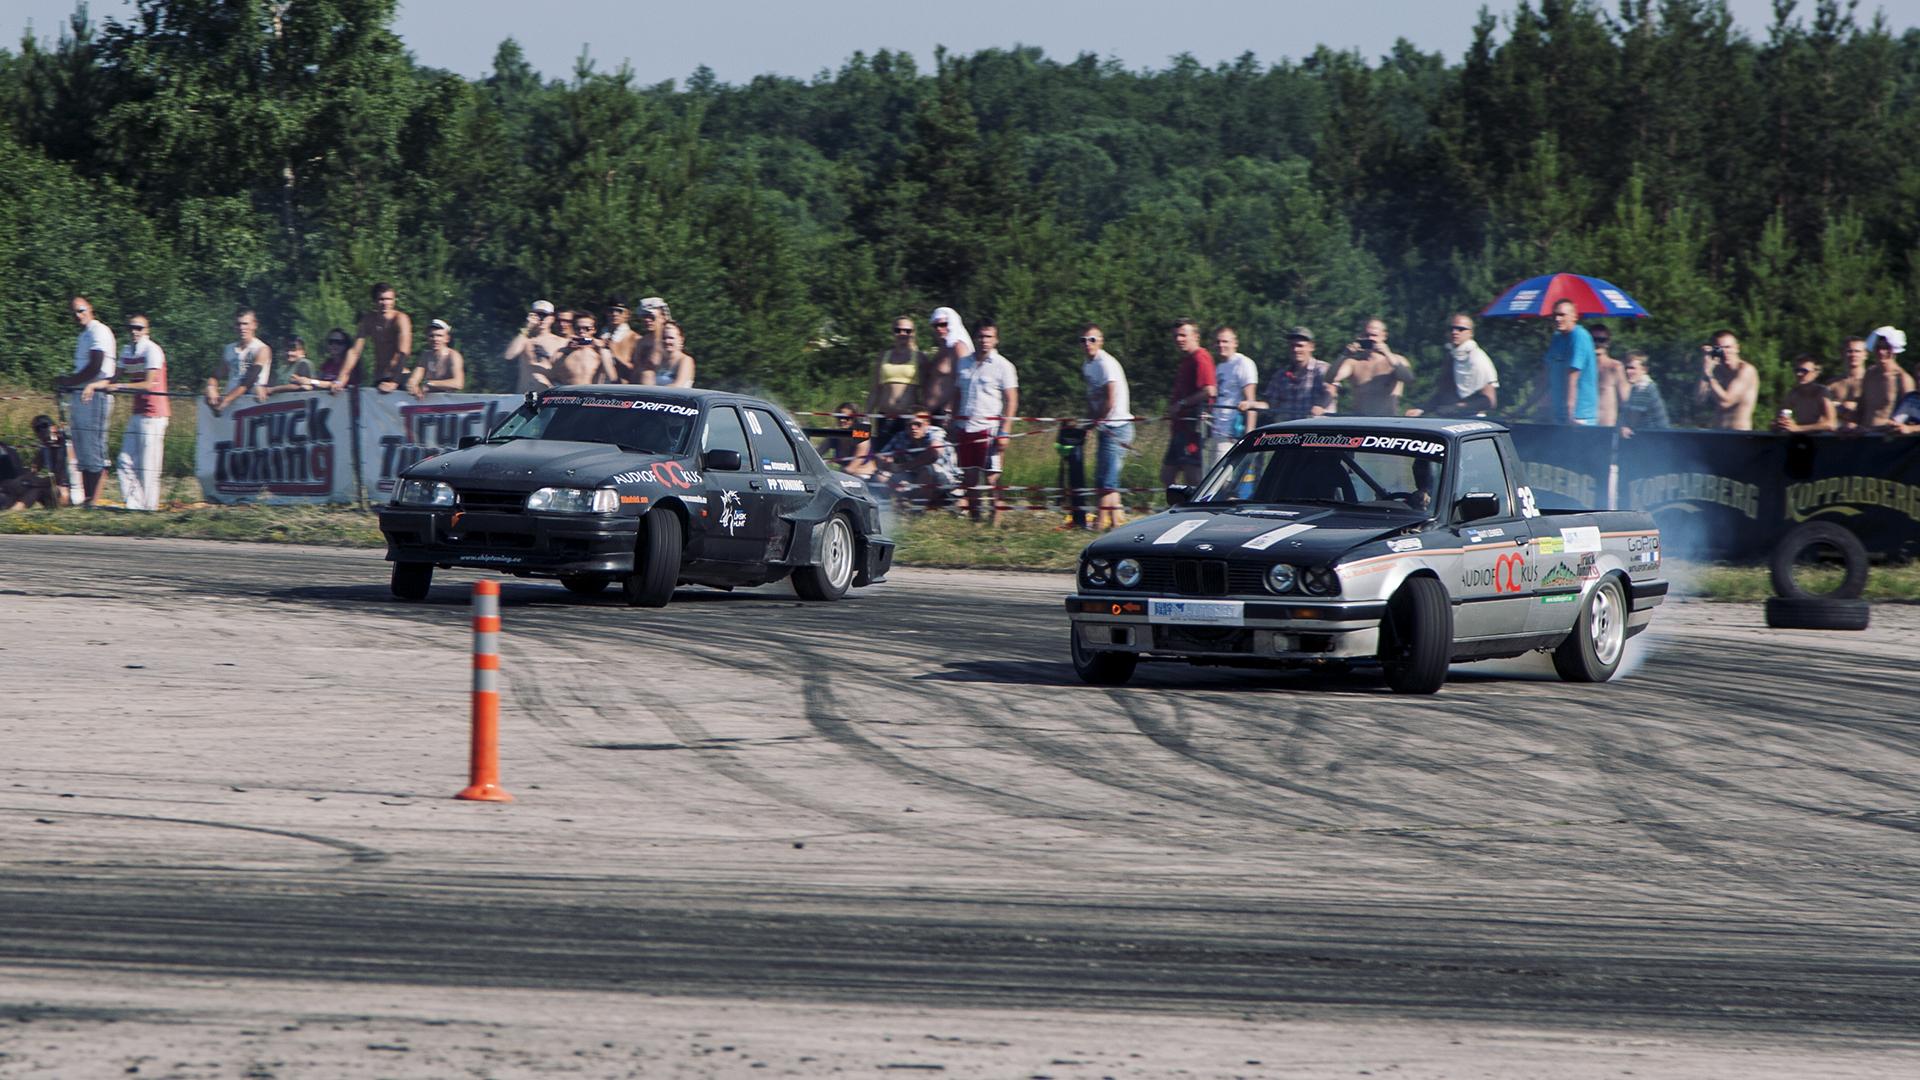 10-years-of-drifting-in-estonia-2011-by-wheelsbywovka-1